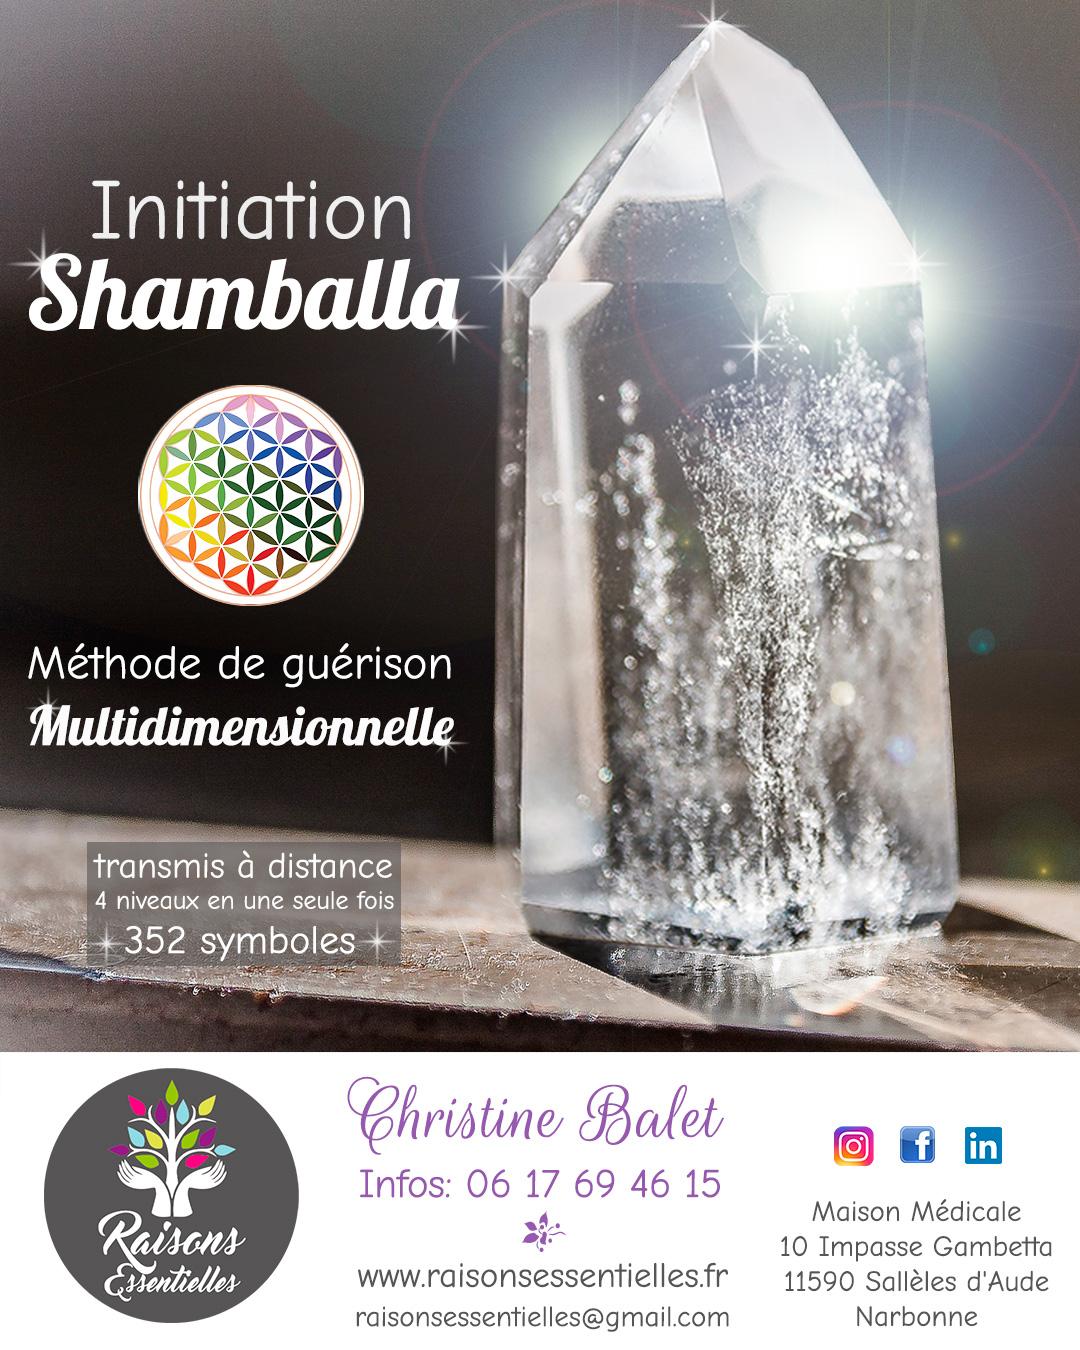 digykan - création bannière - Raisons Essentielles Christine Balet - initiation Shamballa